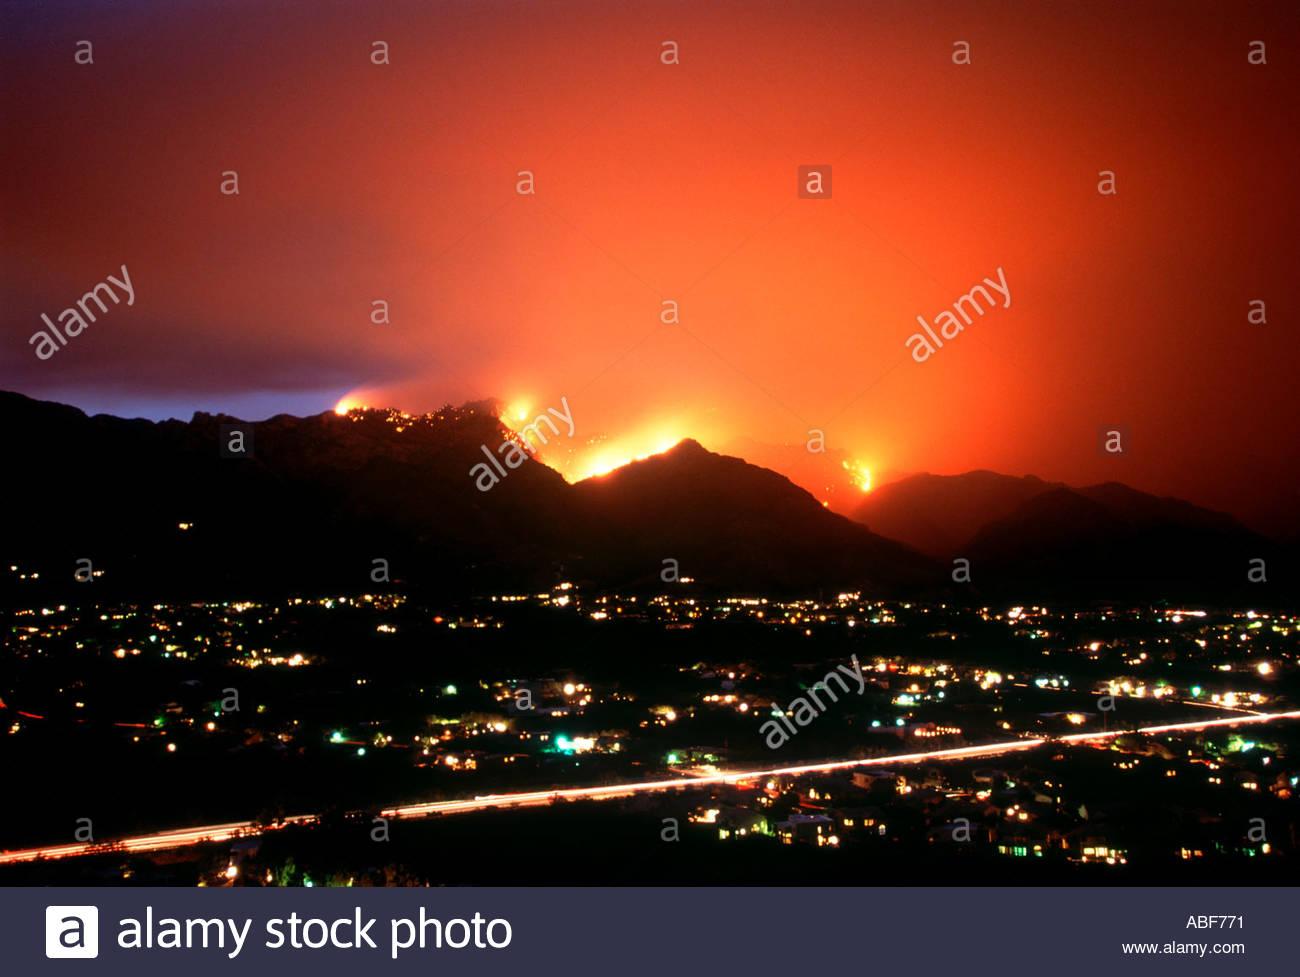 Aspen Fire Burns in the Santa Catalina Mountain Range endangering homes in the foothills of Tucson Arizona 2003 - Stock Image